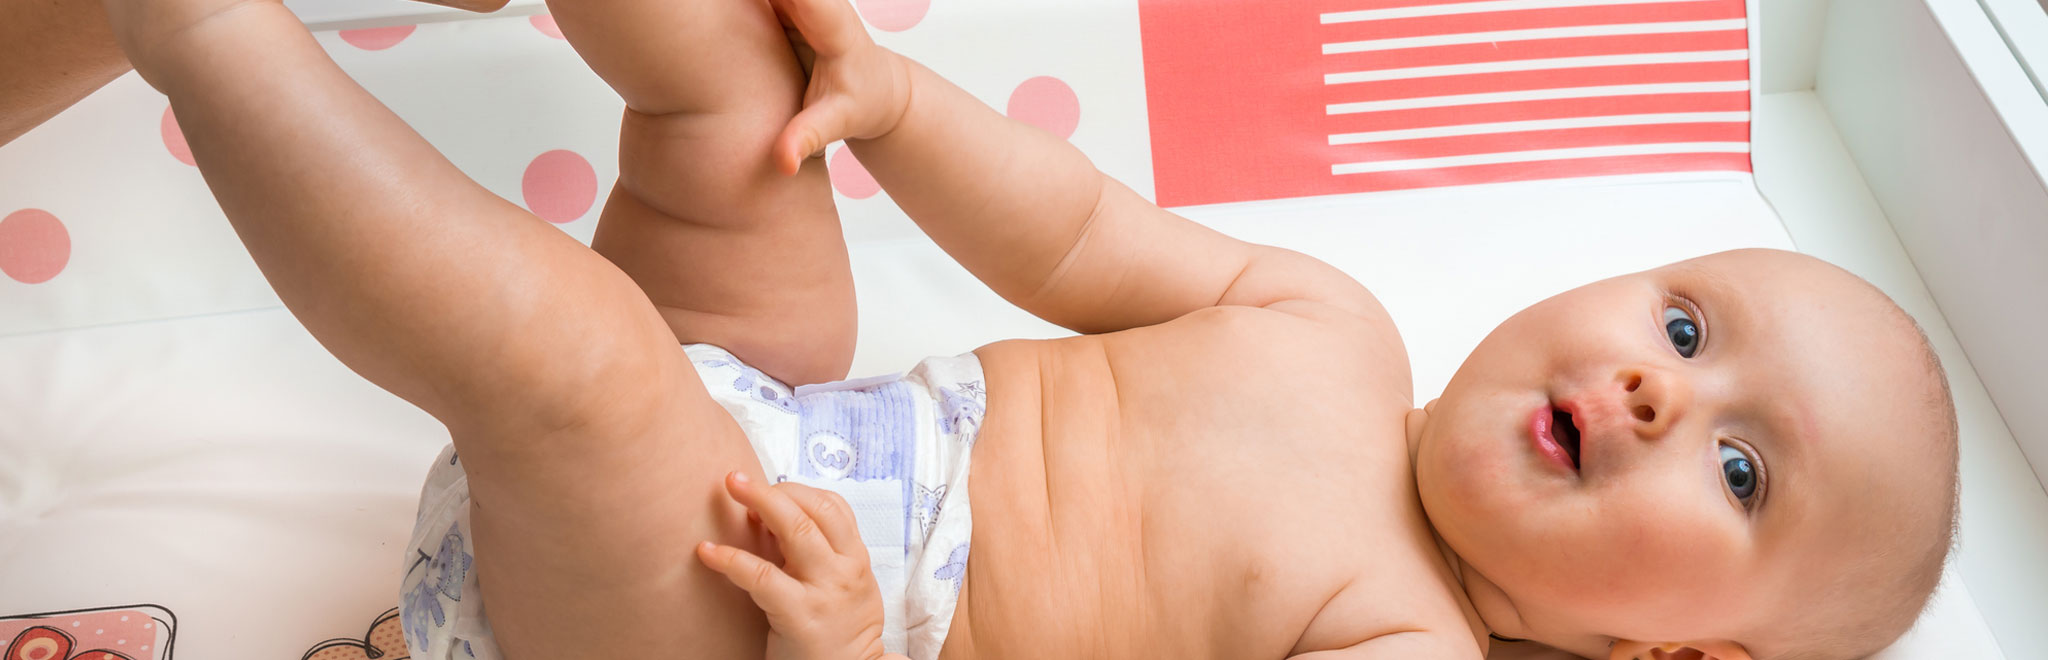 лечебный массаж для детейц